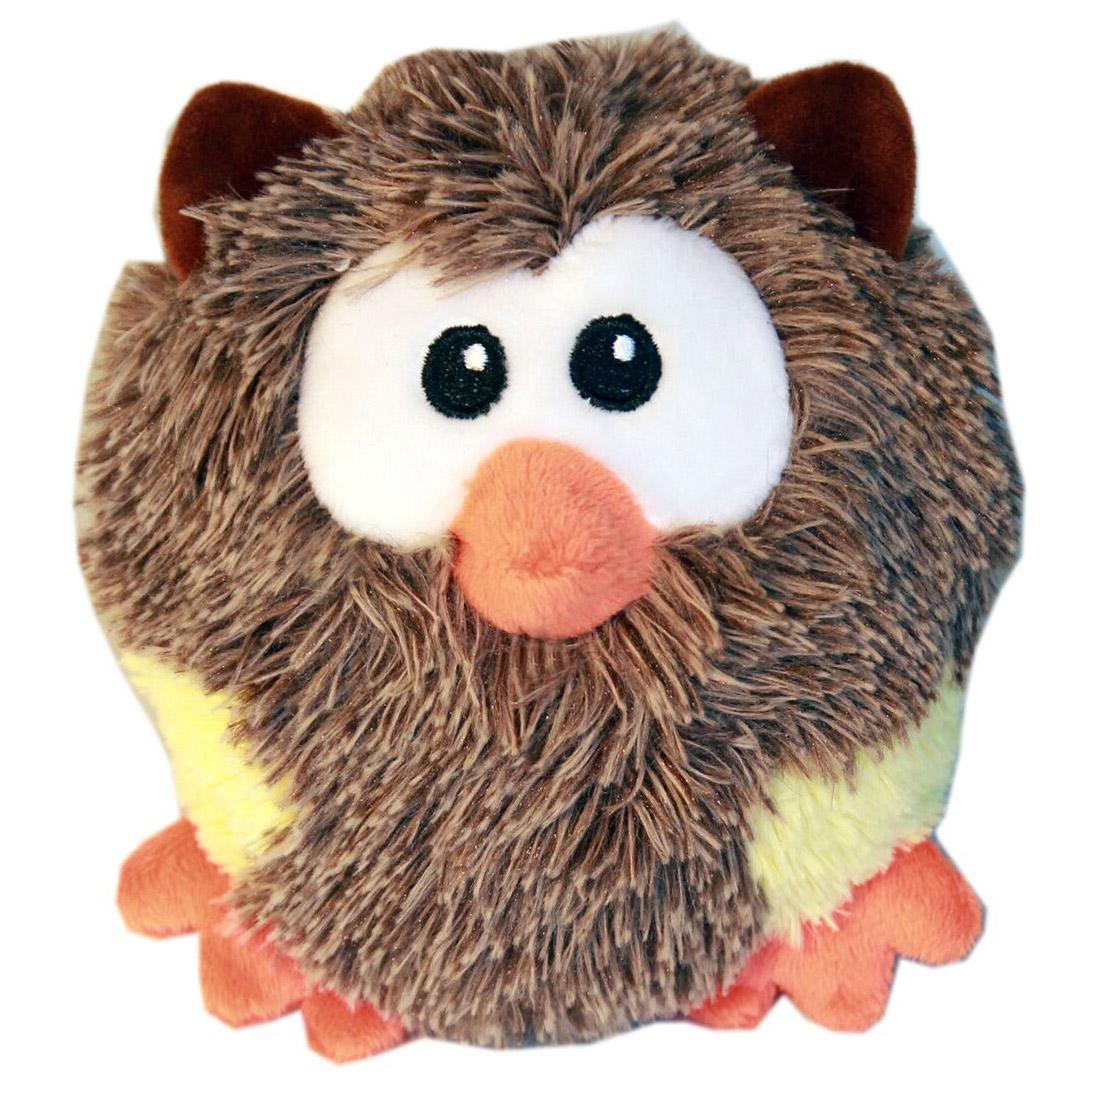 Roundimal Squeaky Dog Toy - Owl